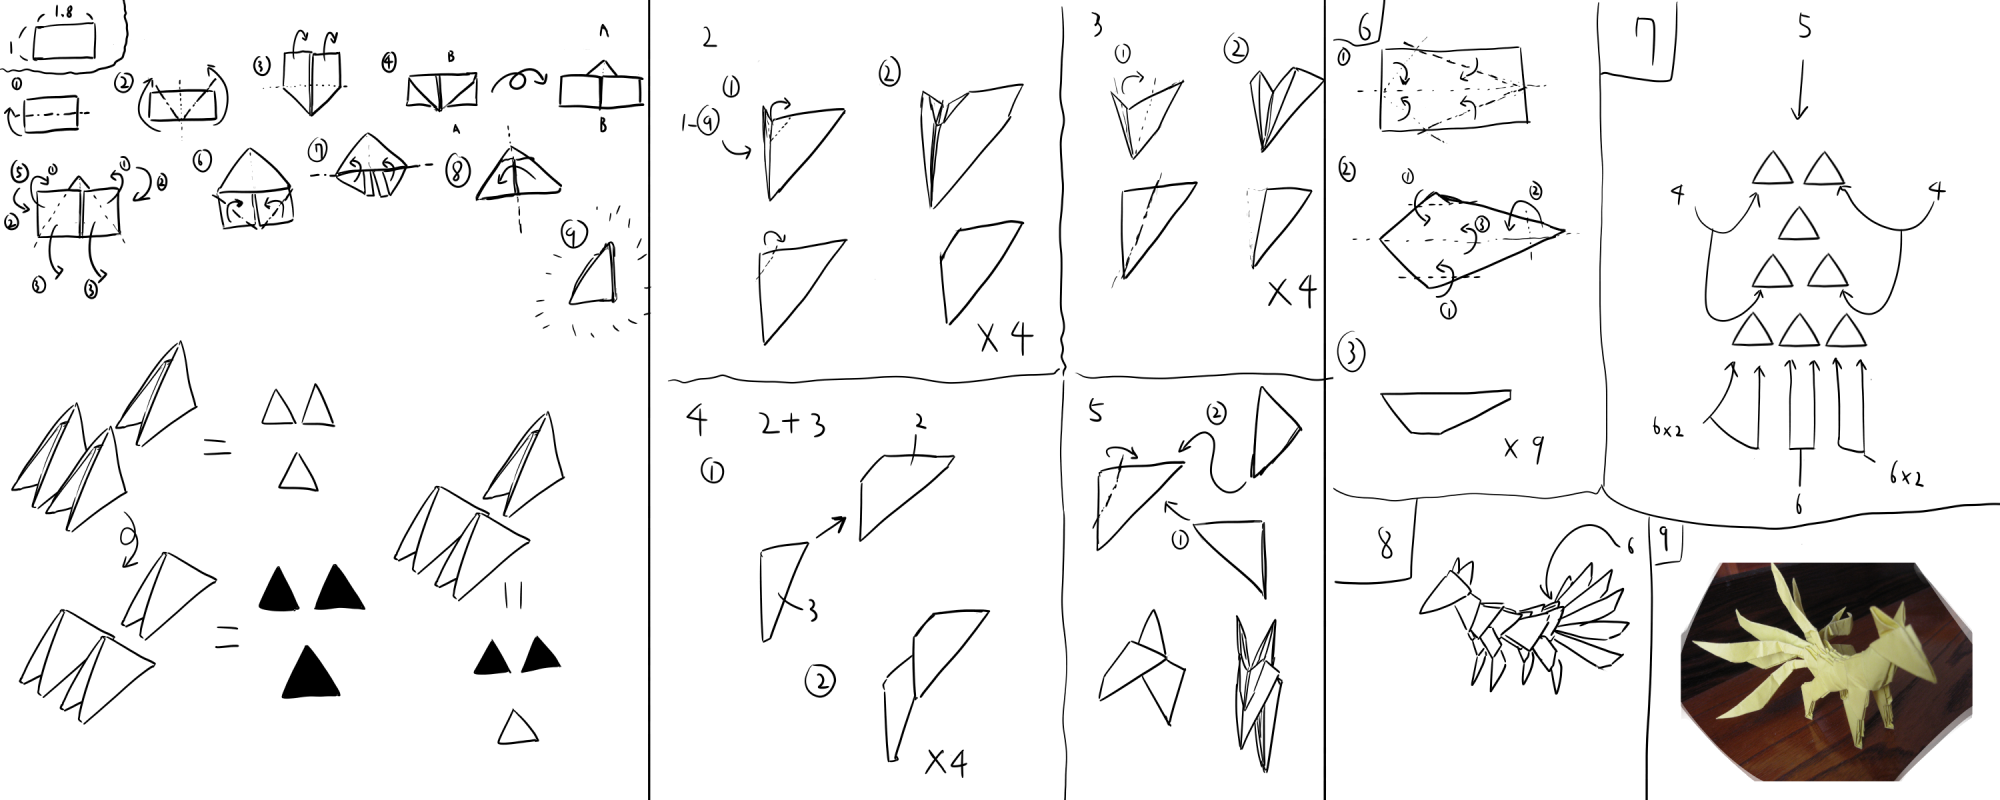 medium resolution of 3d origami nine tailed fox how to build by kumazaza deviantart com3d origami nine tailed fox